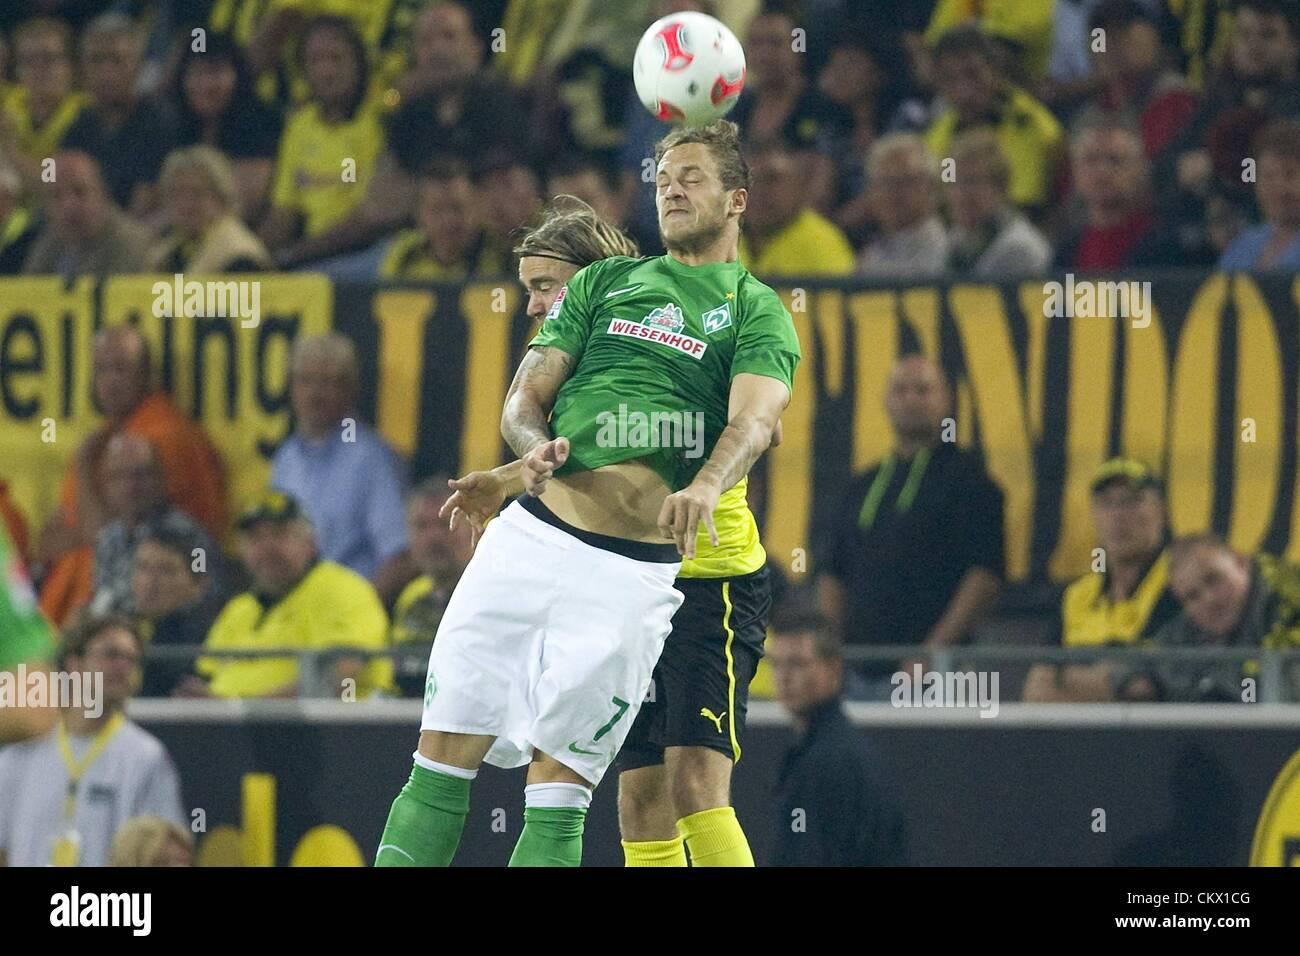 24.08.2012. Dortmund, Germany.  Borussia Dortmund versus SV  Werder Bremen. Marko Arnautovic  HB against Marcel - Stock Image